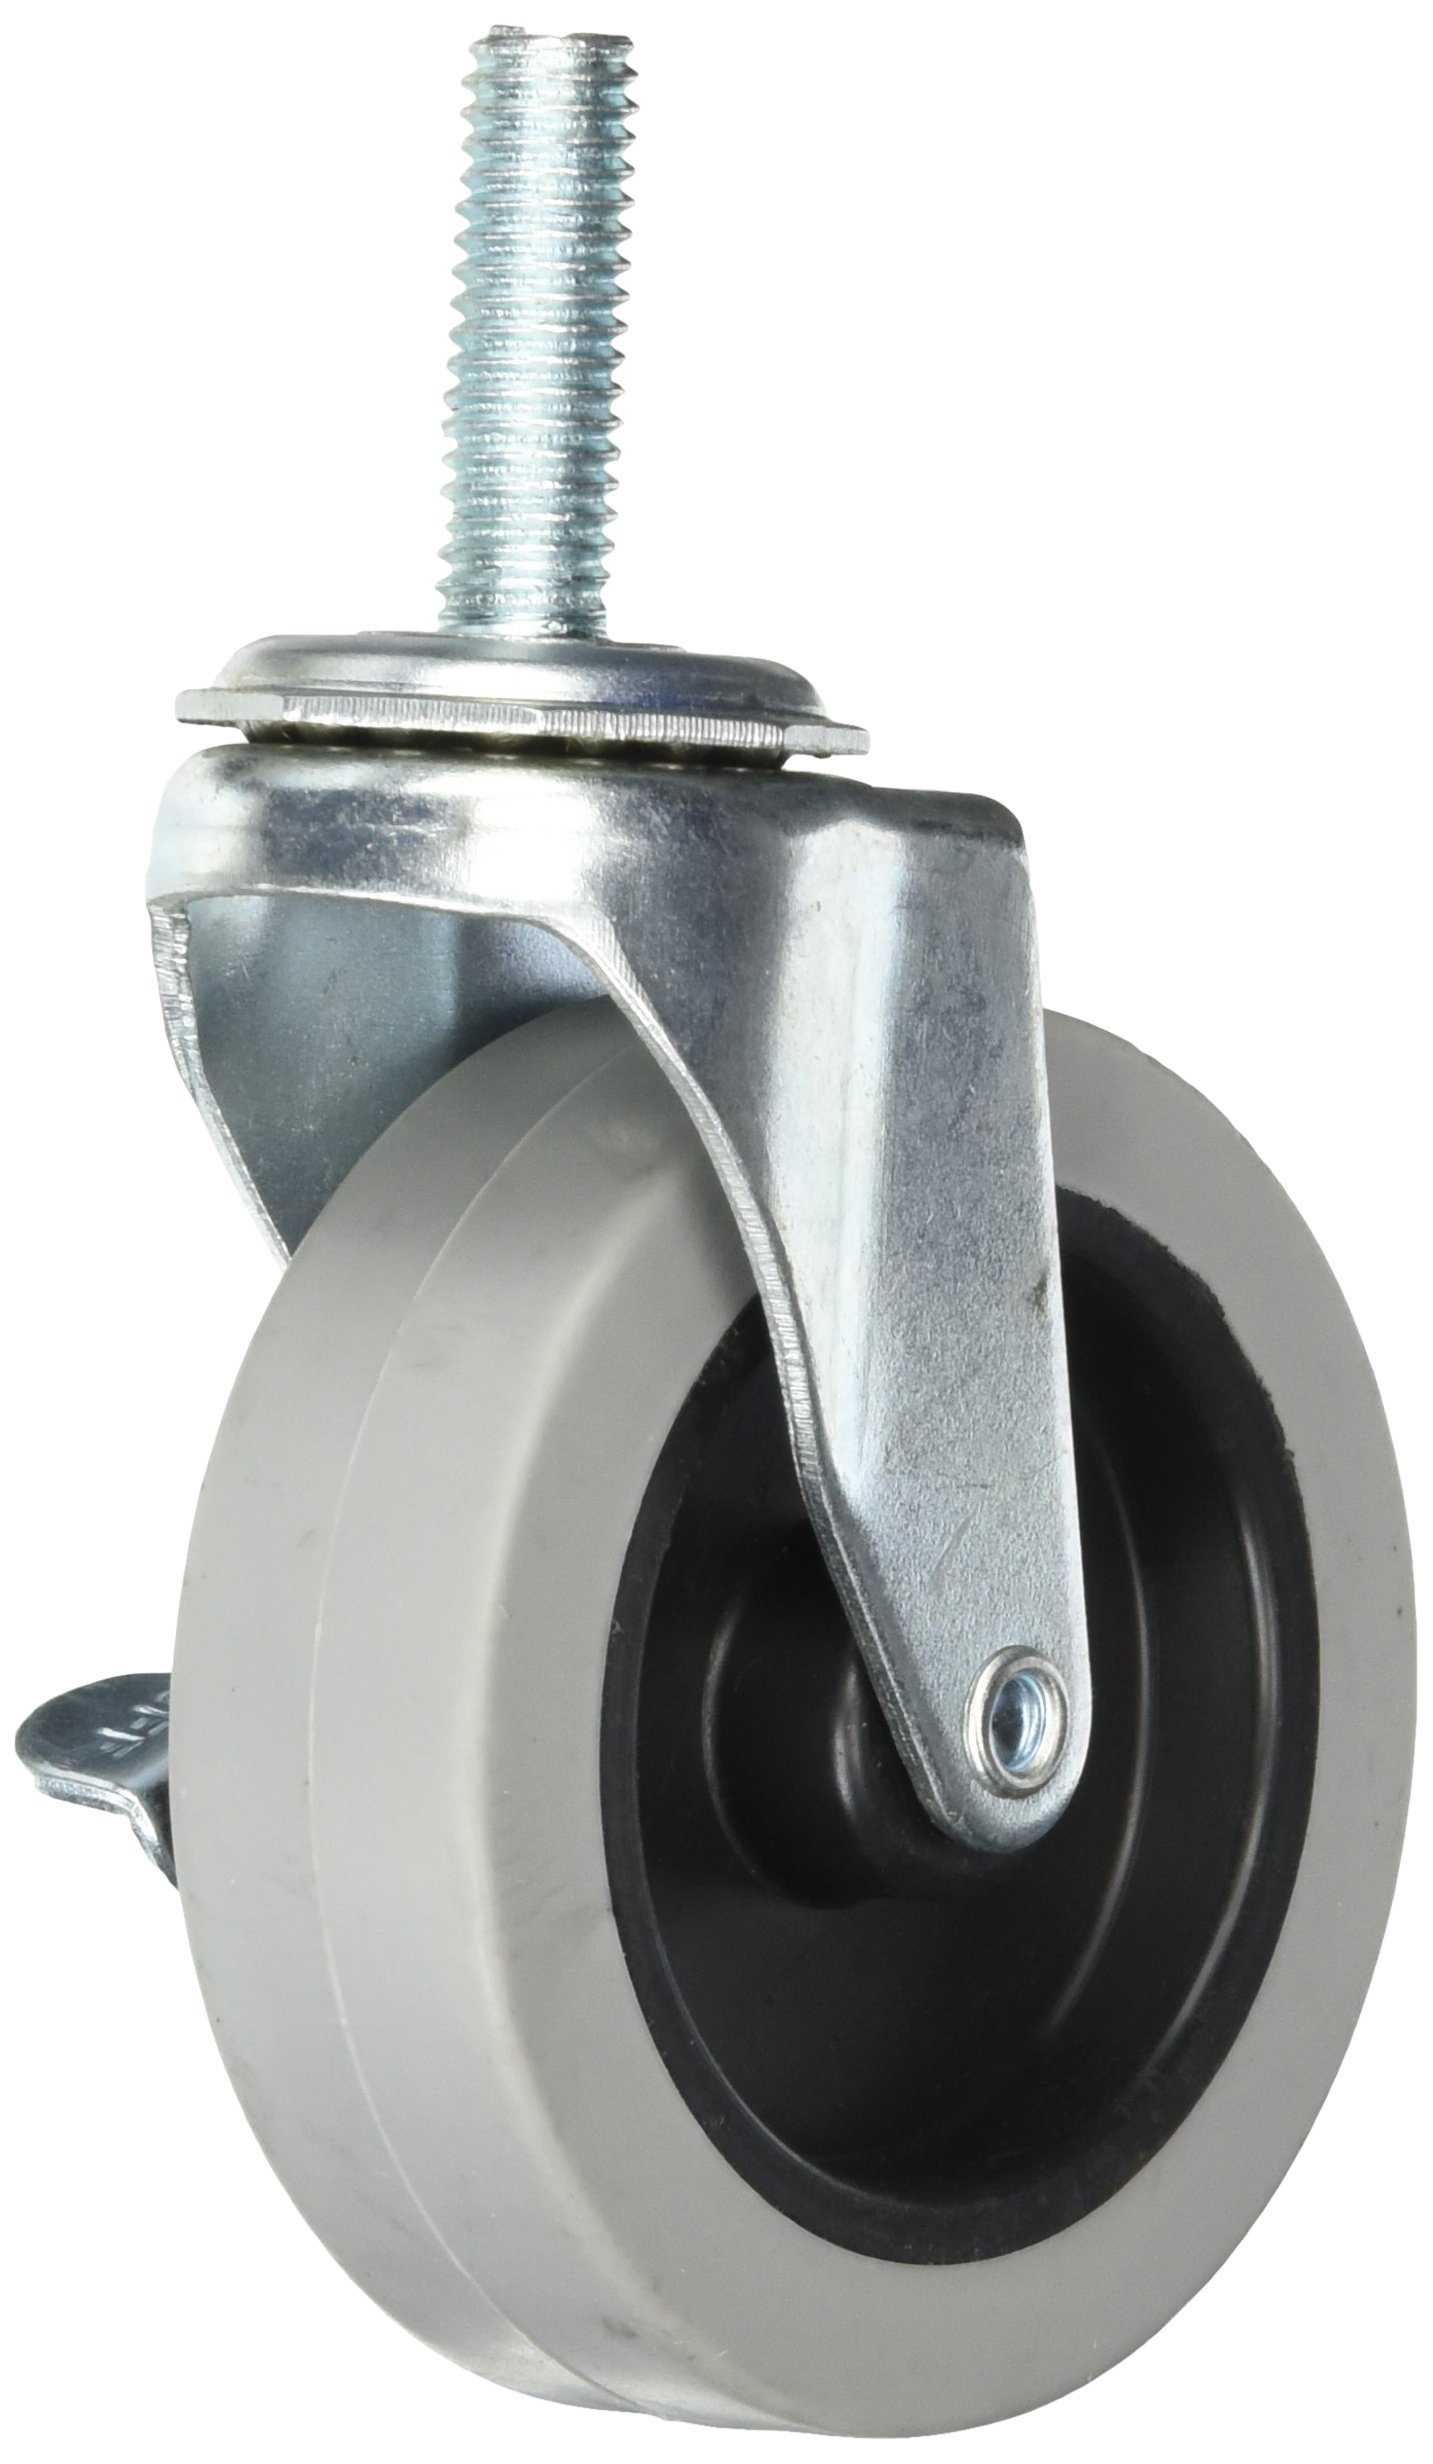 Quantum Storage Systems WR-3 4 Piece 3'' Diameter Polyurethane Wheel Swivel Caster Set with Brakes, 200 lbs Capacity